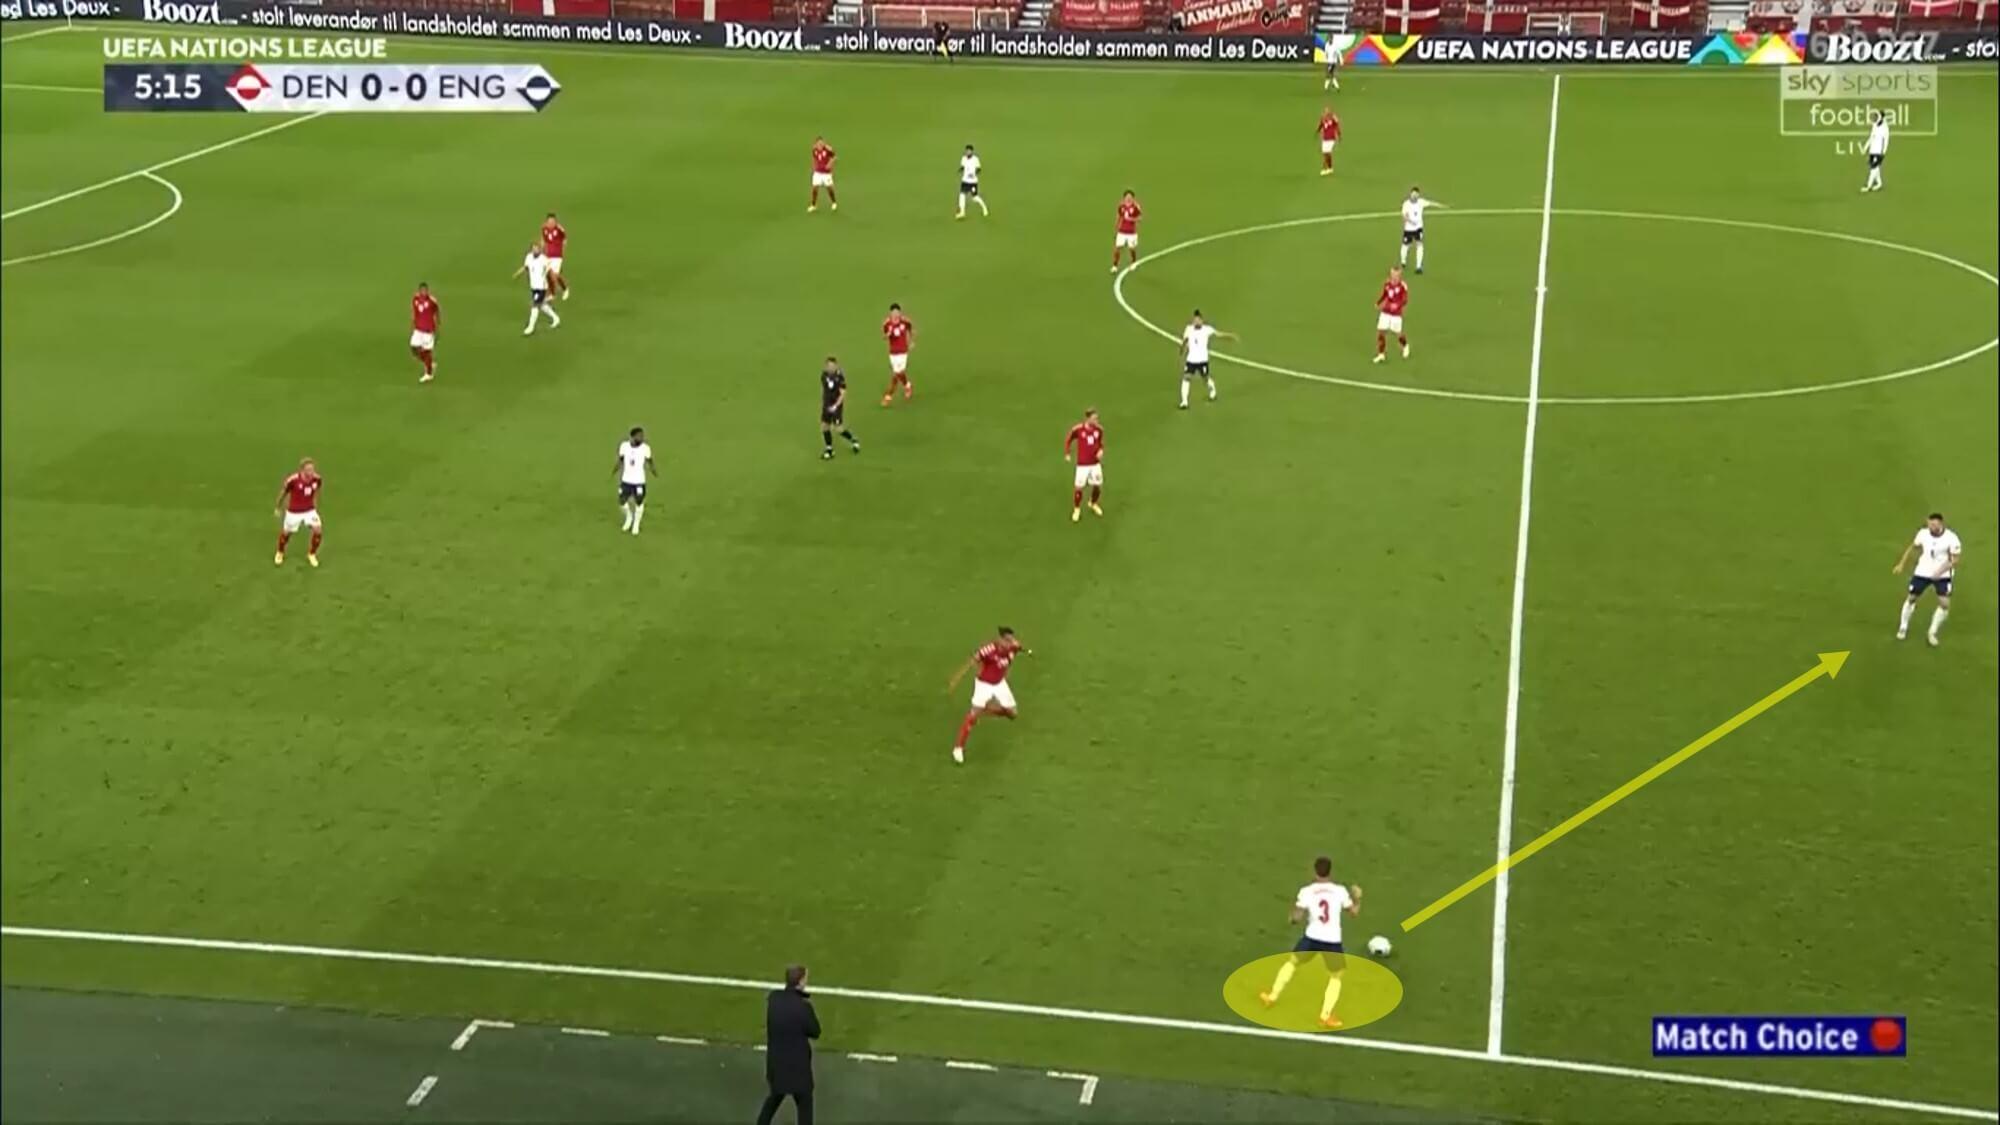 UEFA Nations League 2020/21: Denmark vs England - tactical analysis tactics